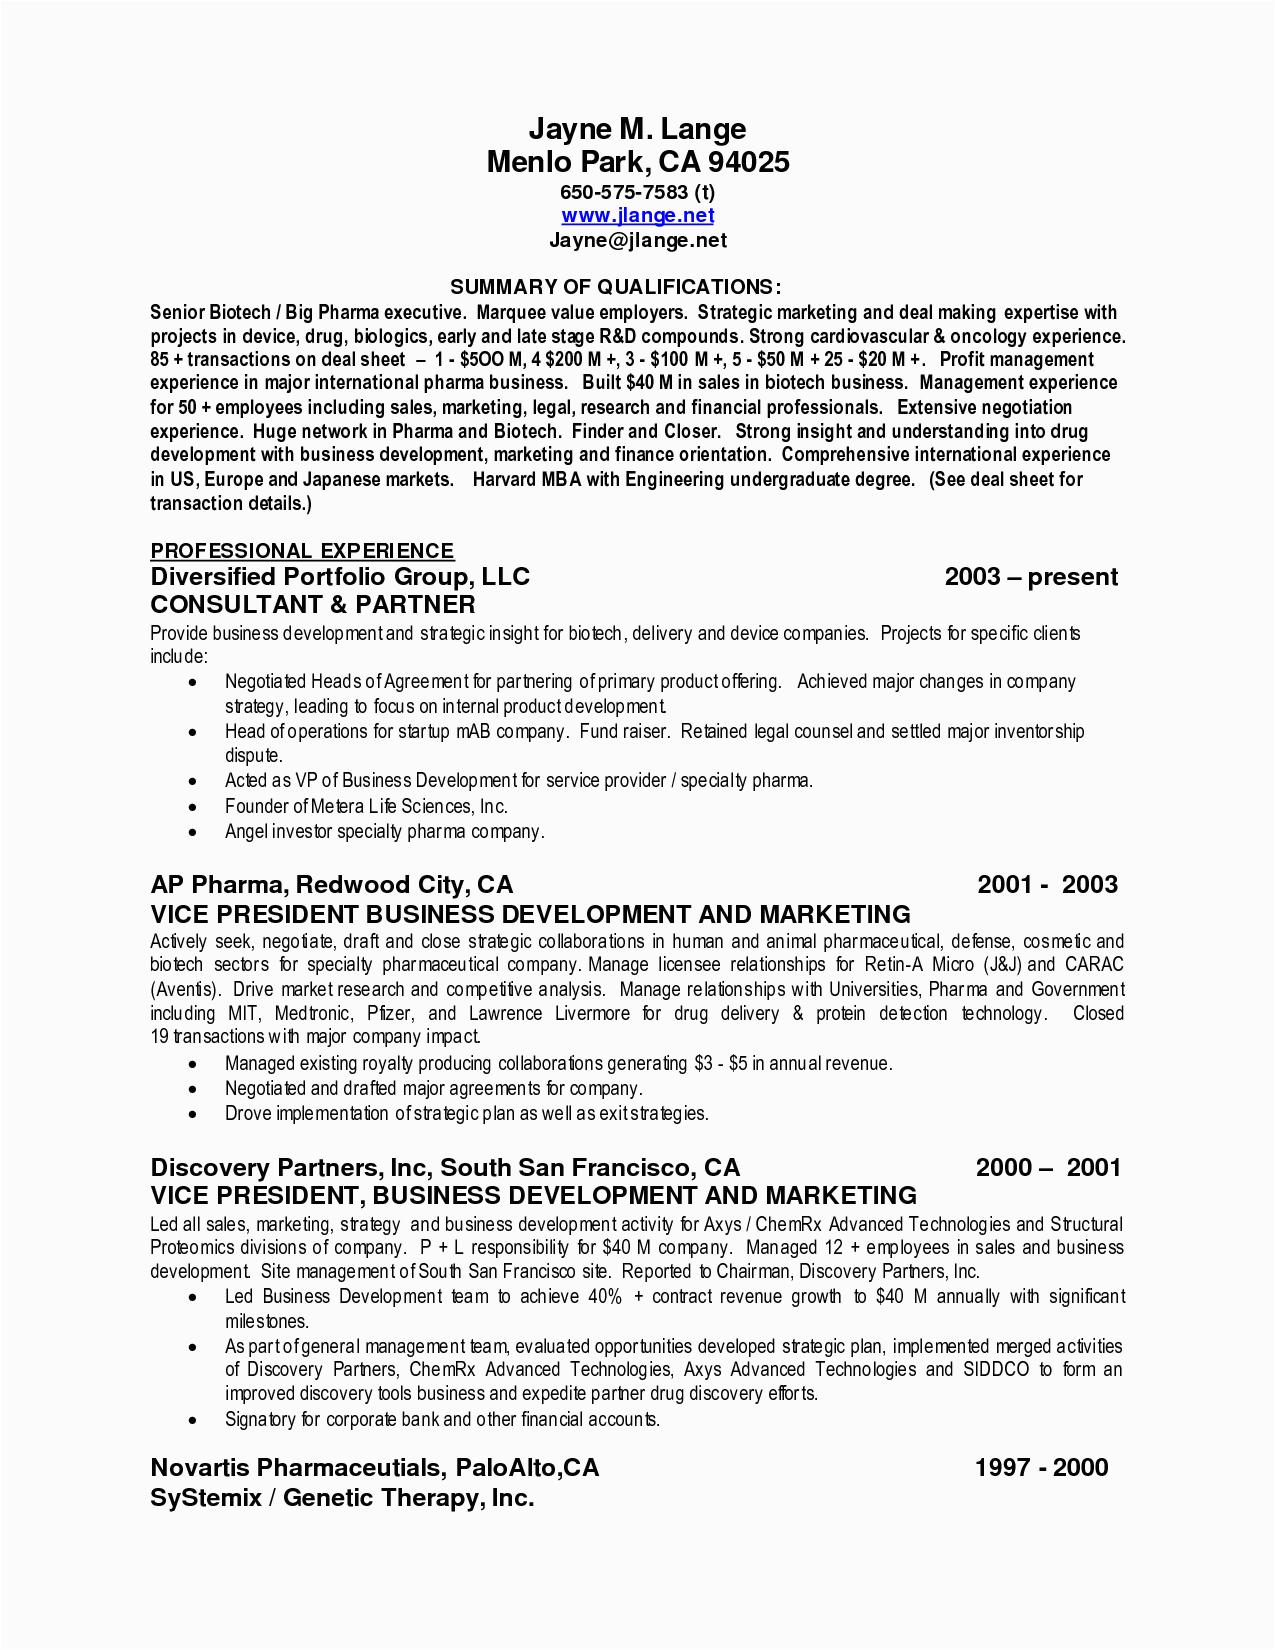 Sample Professional Resume Summary Of Qualifications Best Summary Of Qualifications Resume for 2016